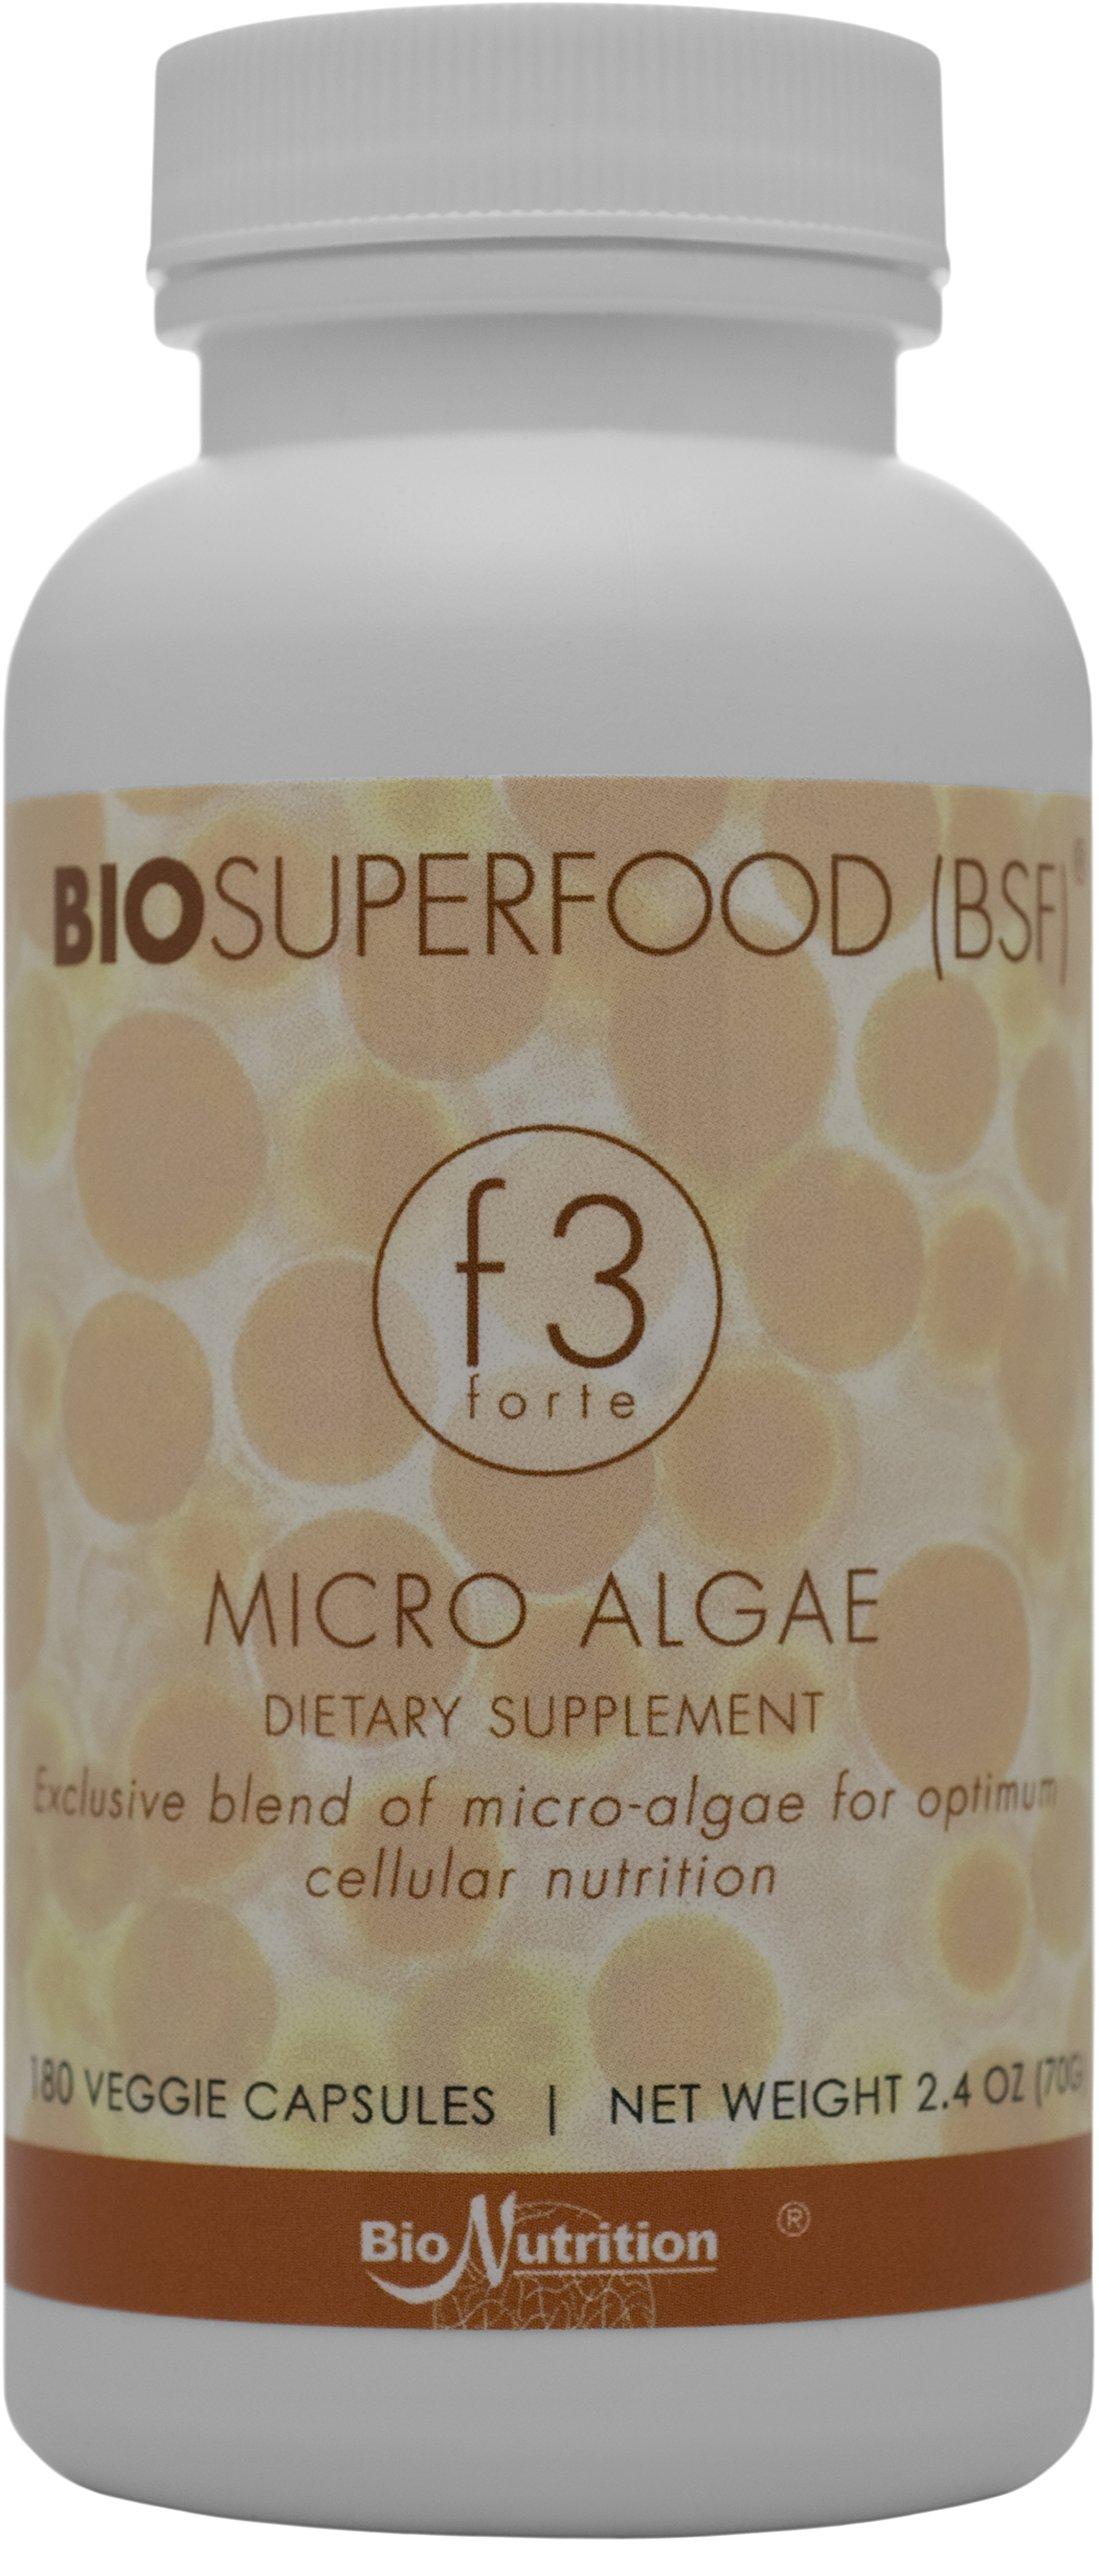 Biosuperfood F3 Forte Micro Algae (180 Veg Capsules)